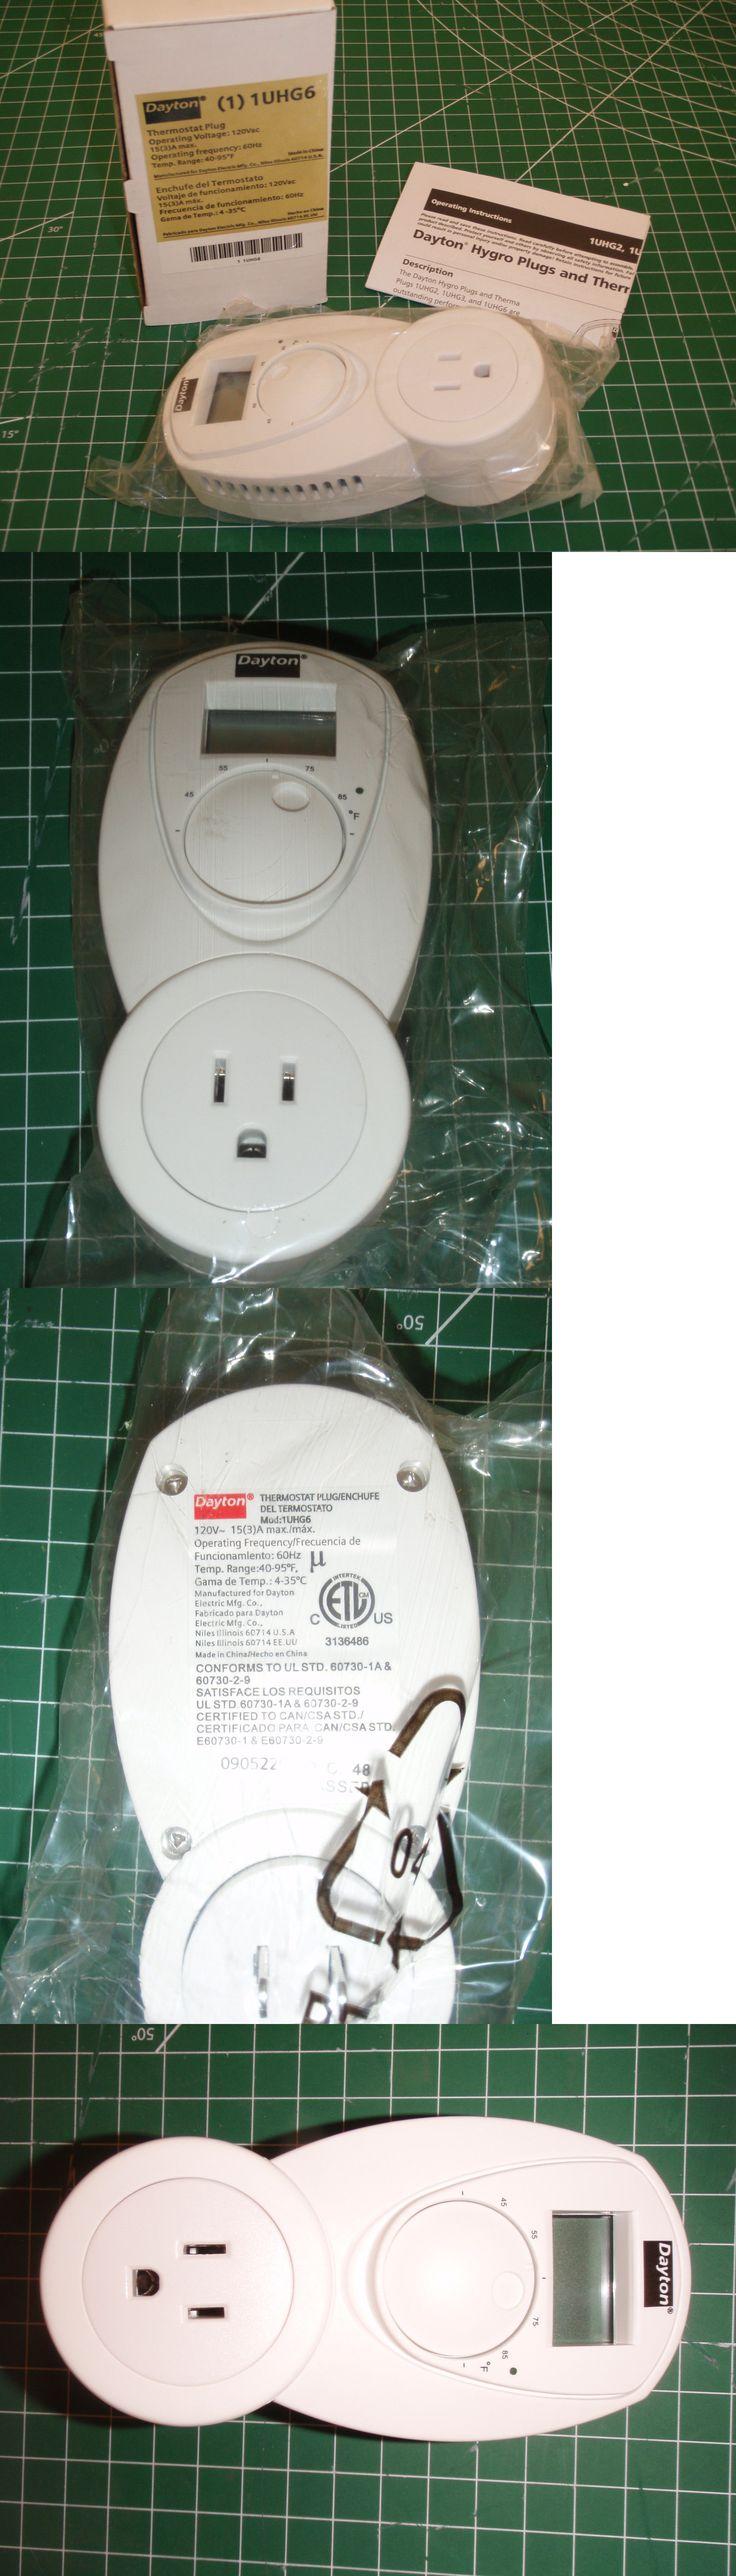 top 25+ best portable heater ideas on pinterest | portable power